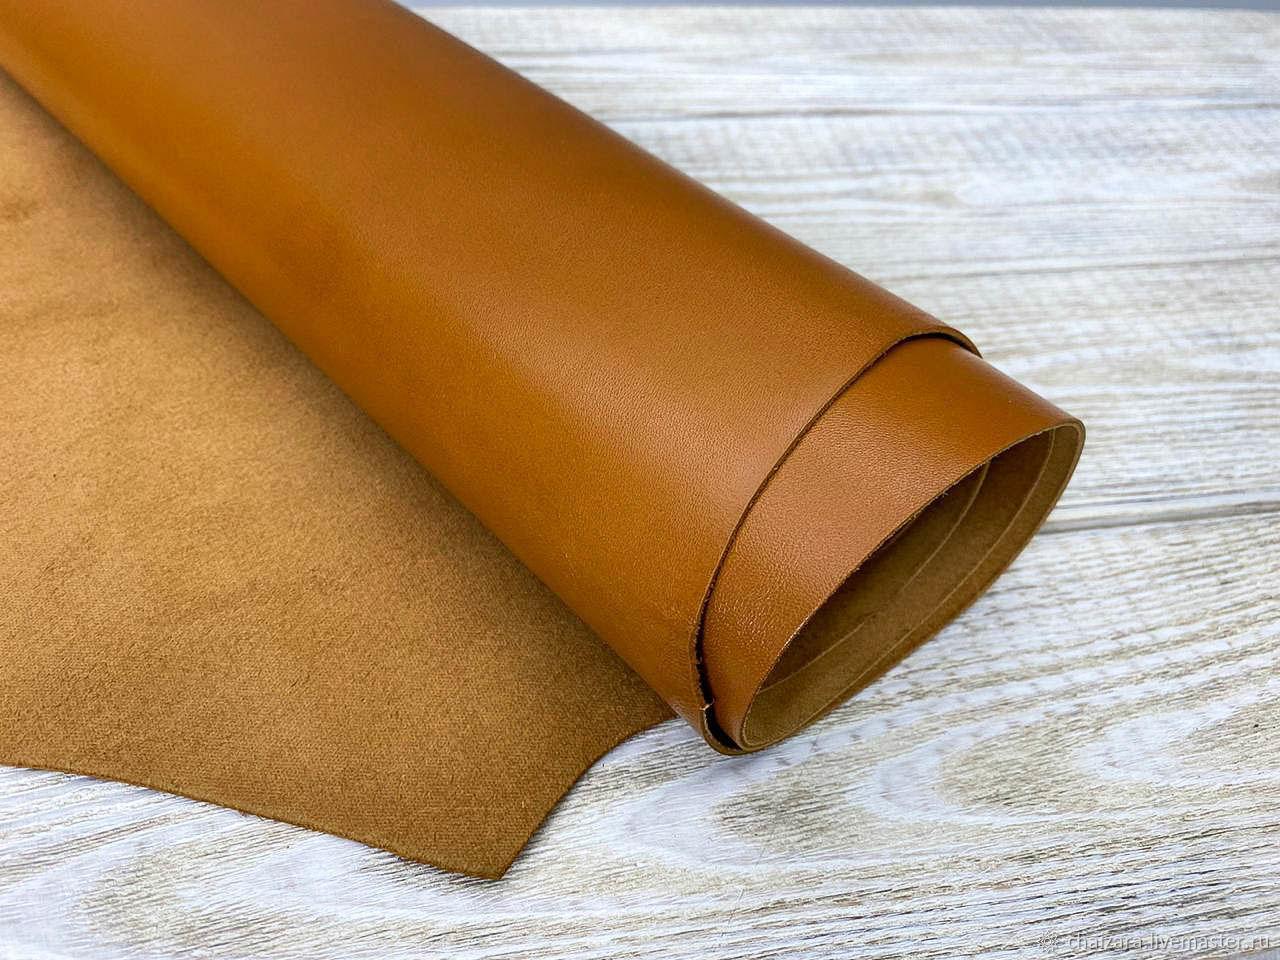 Натуральная кожа 1.2-1.4 мм Boulanger Brown, Кожа, Оренбург,  Фото №1